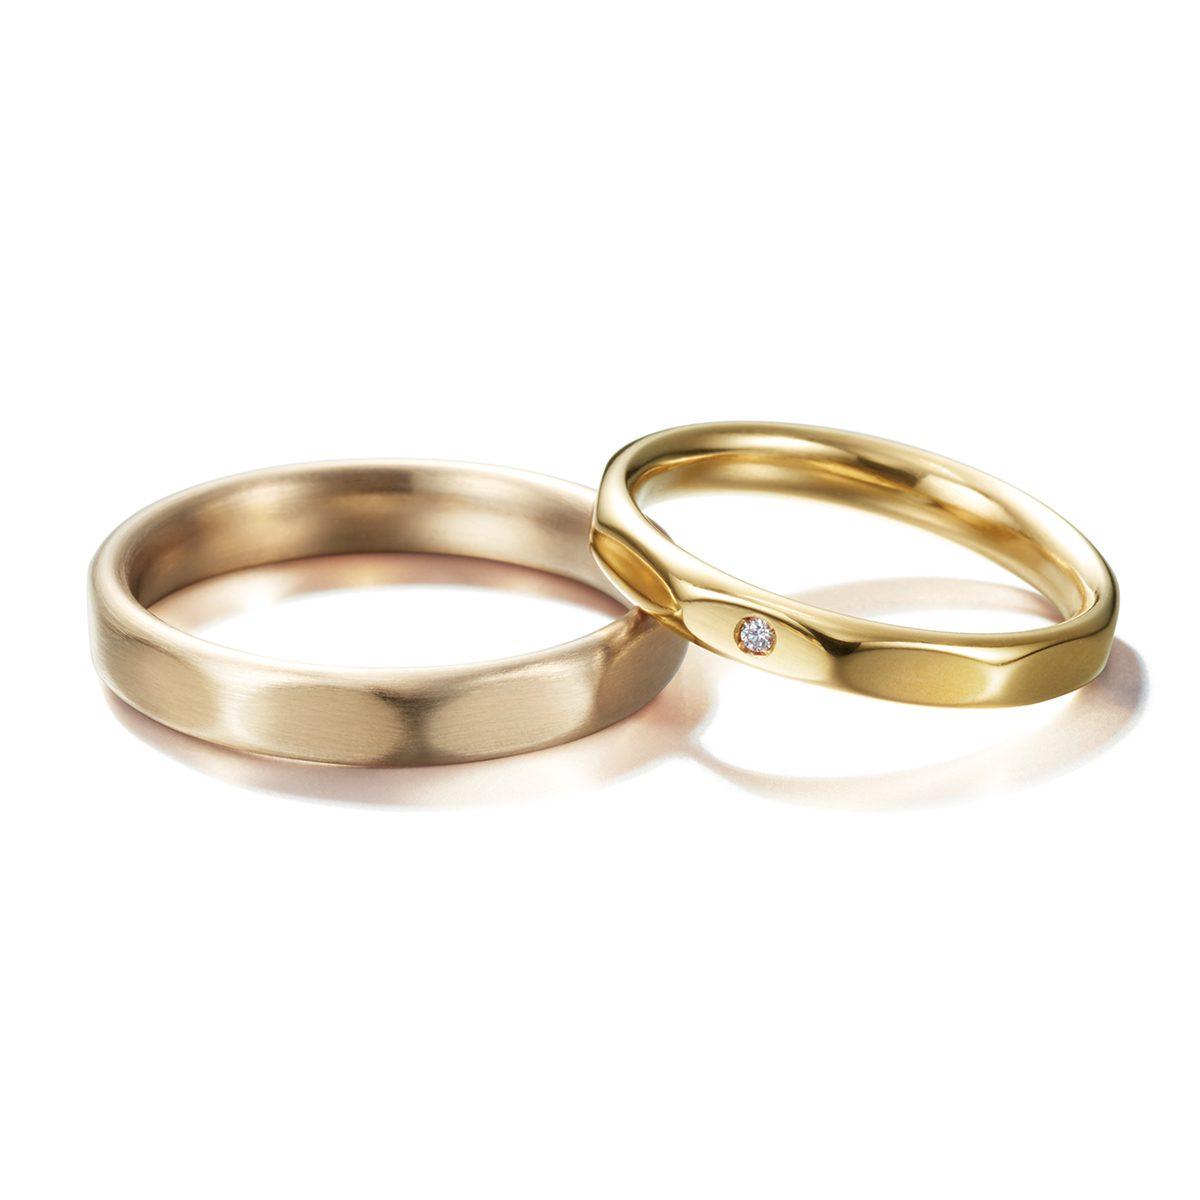 LIA DI GREGORIO - POIS Marriage Rings